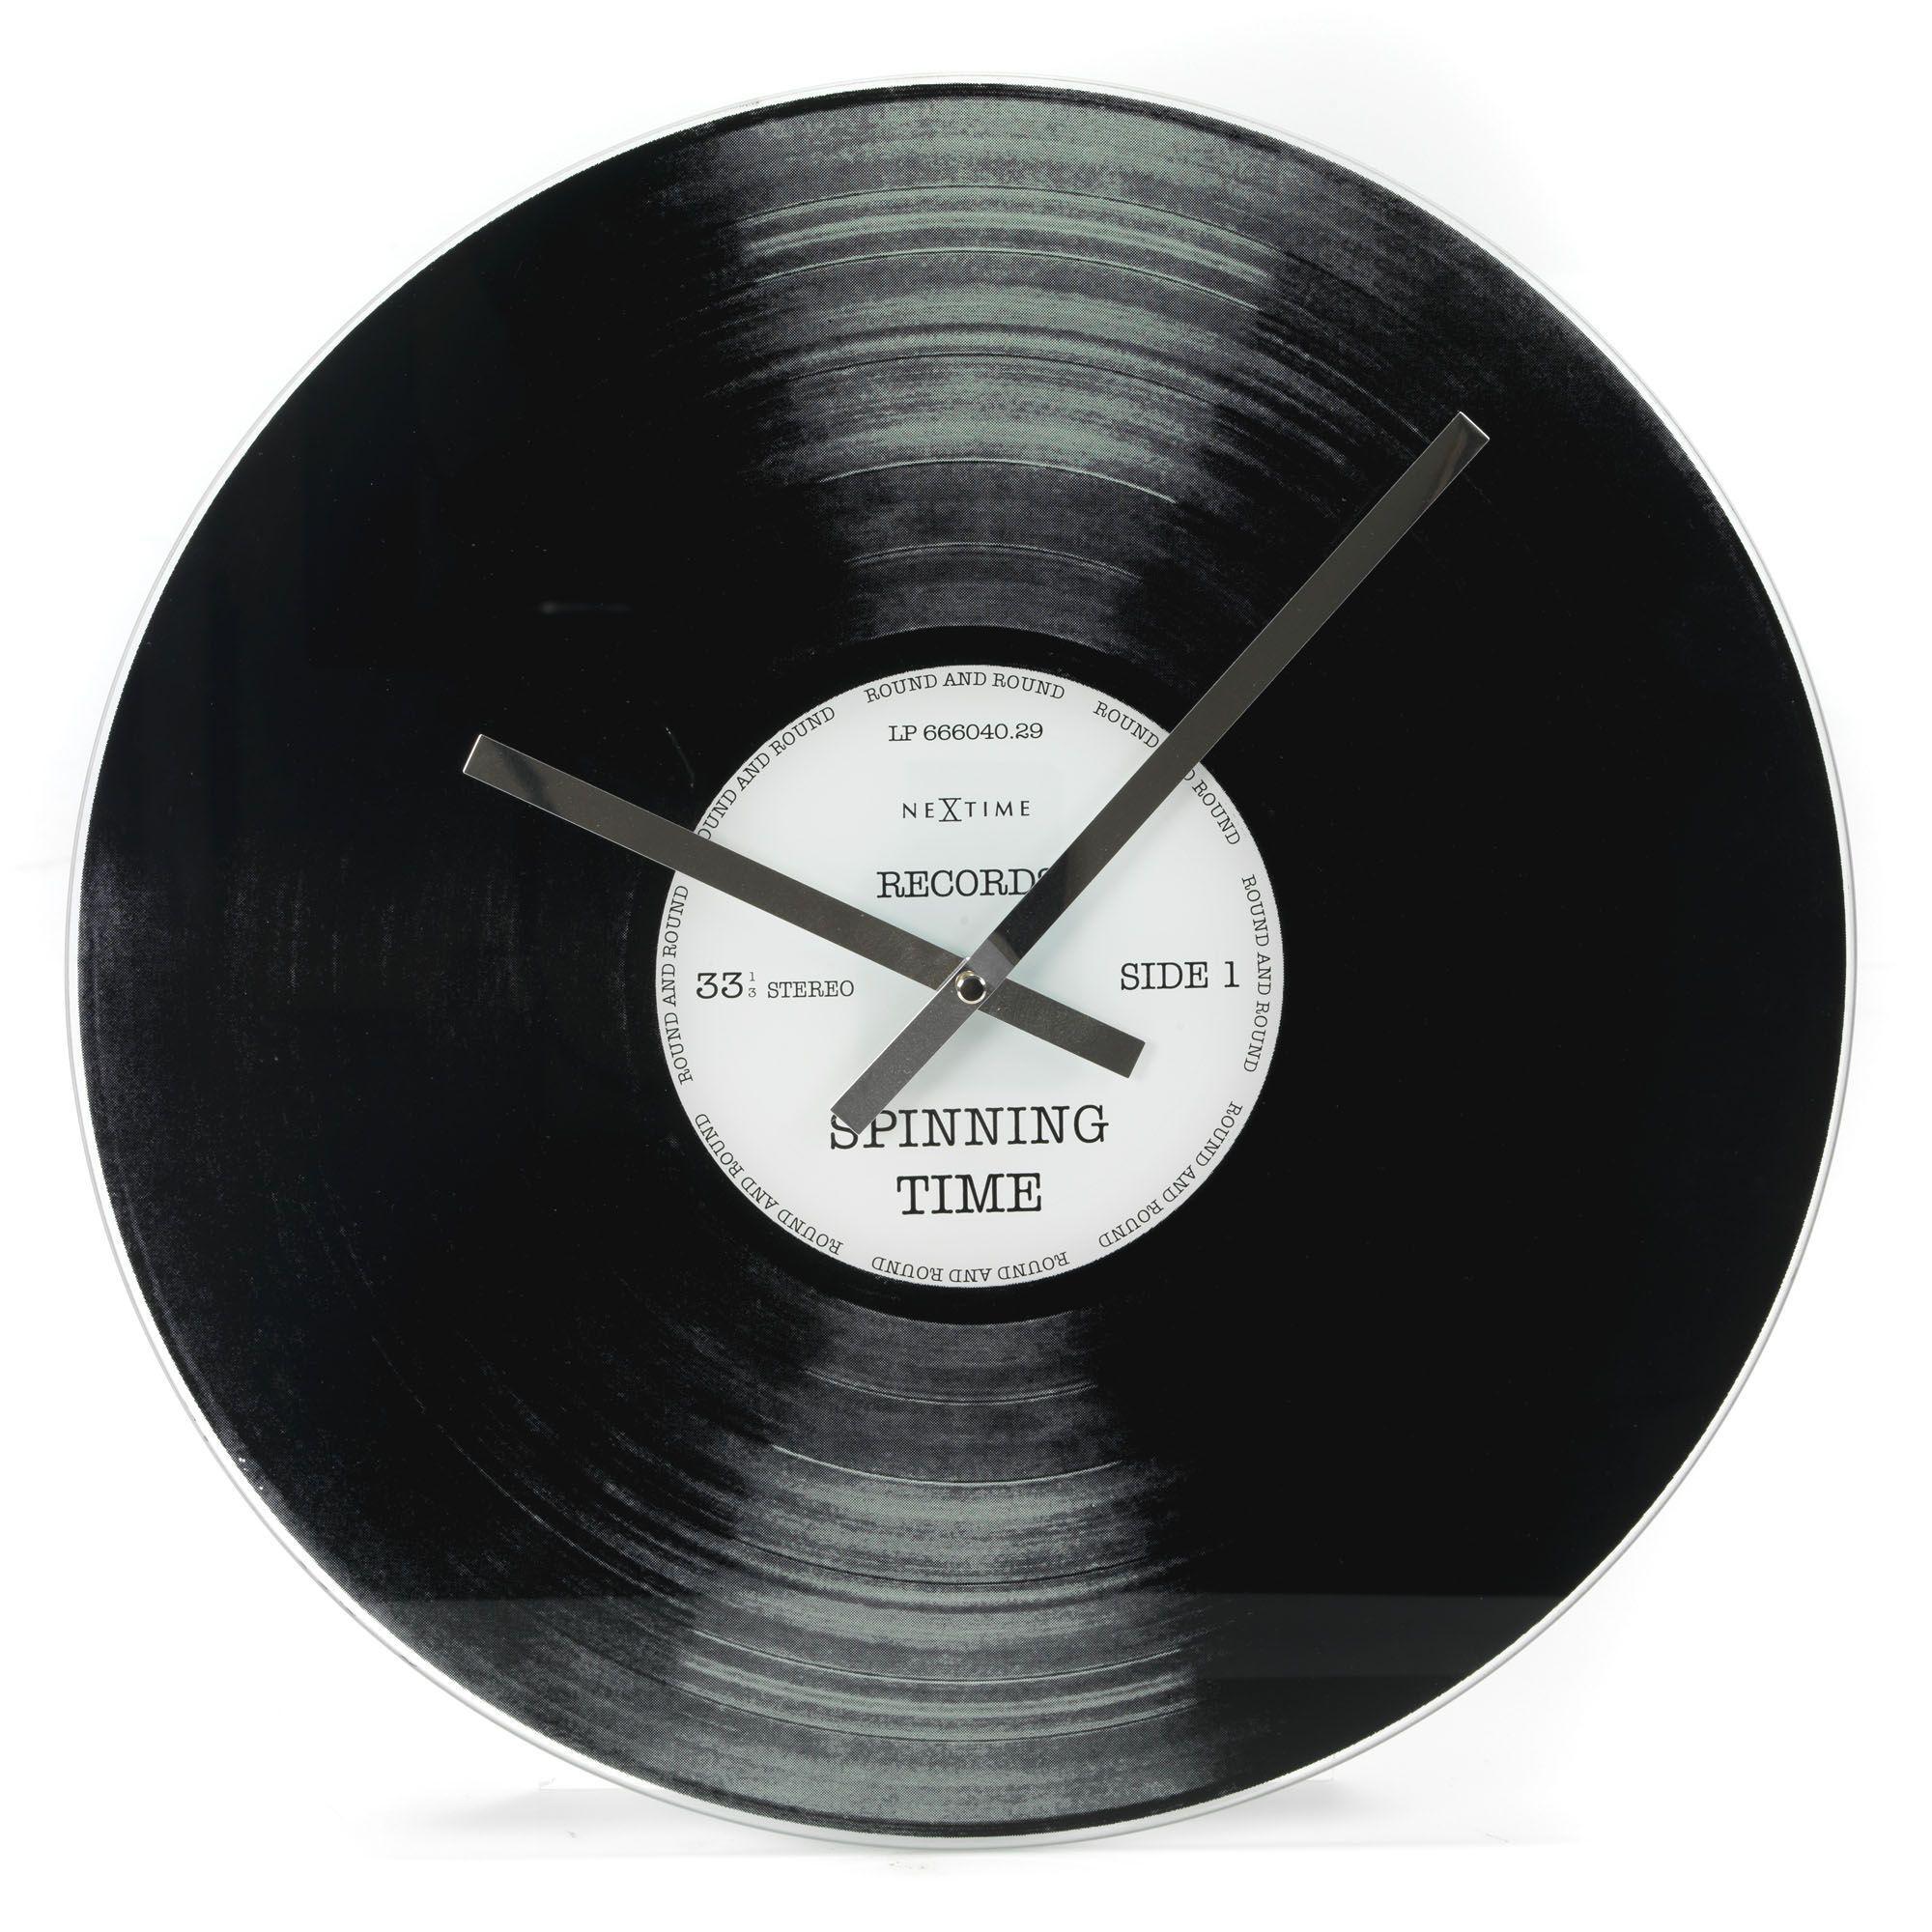 grande horloge murale 43cm de diamètre noir blanc spinning